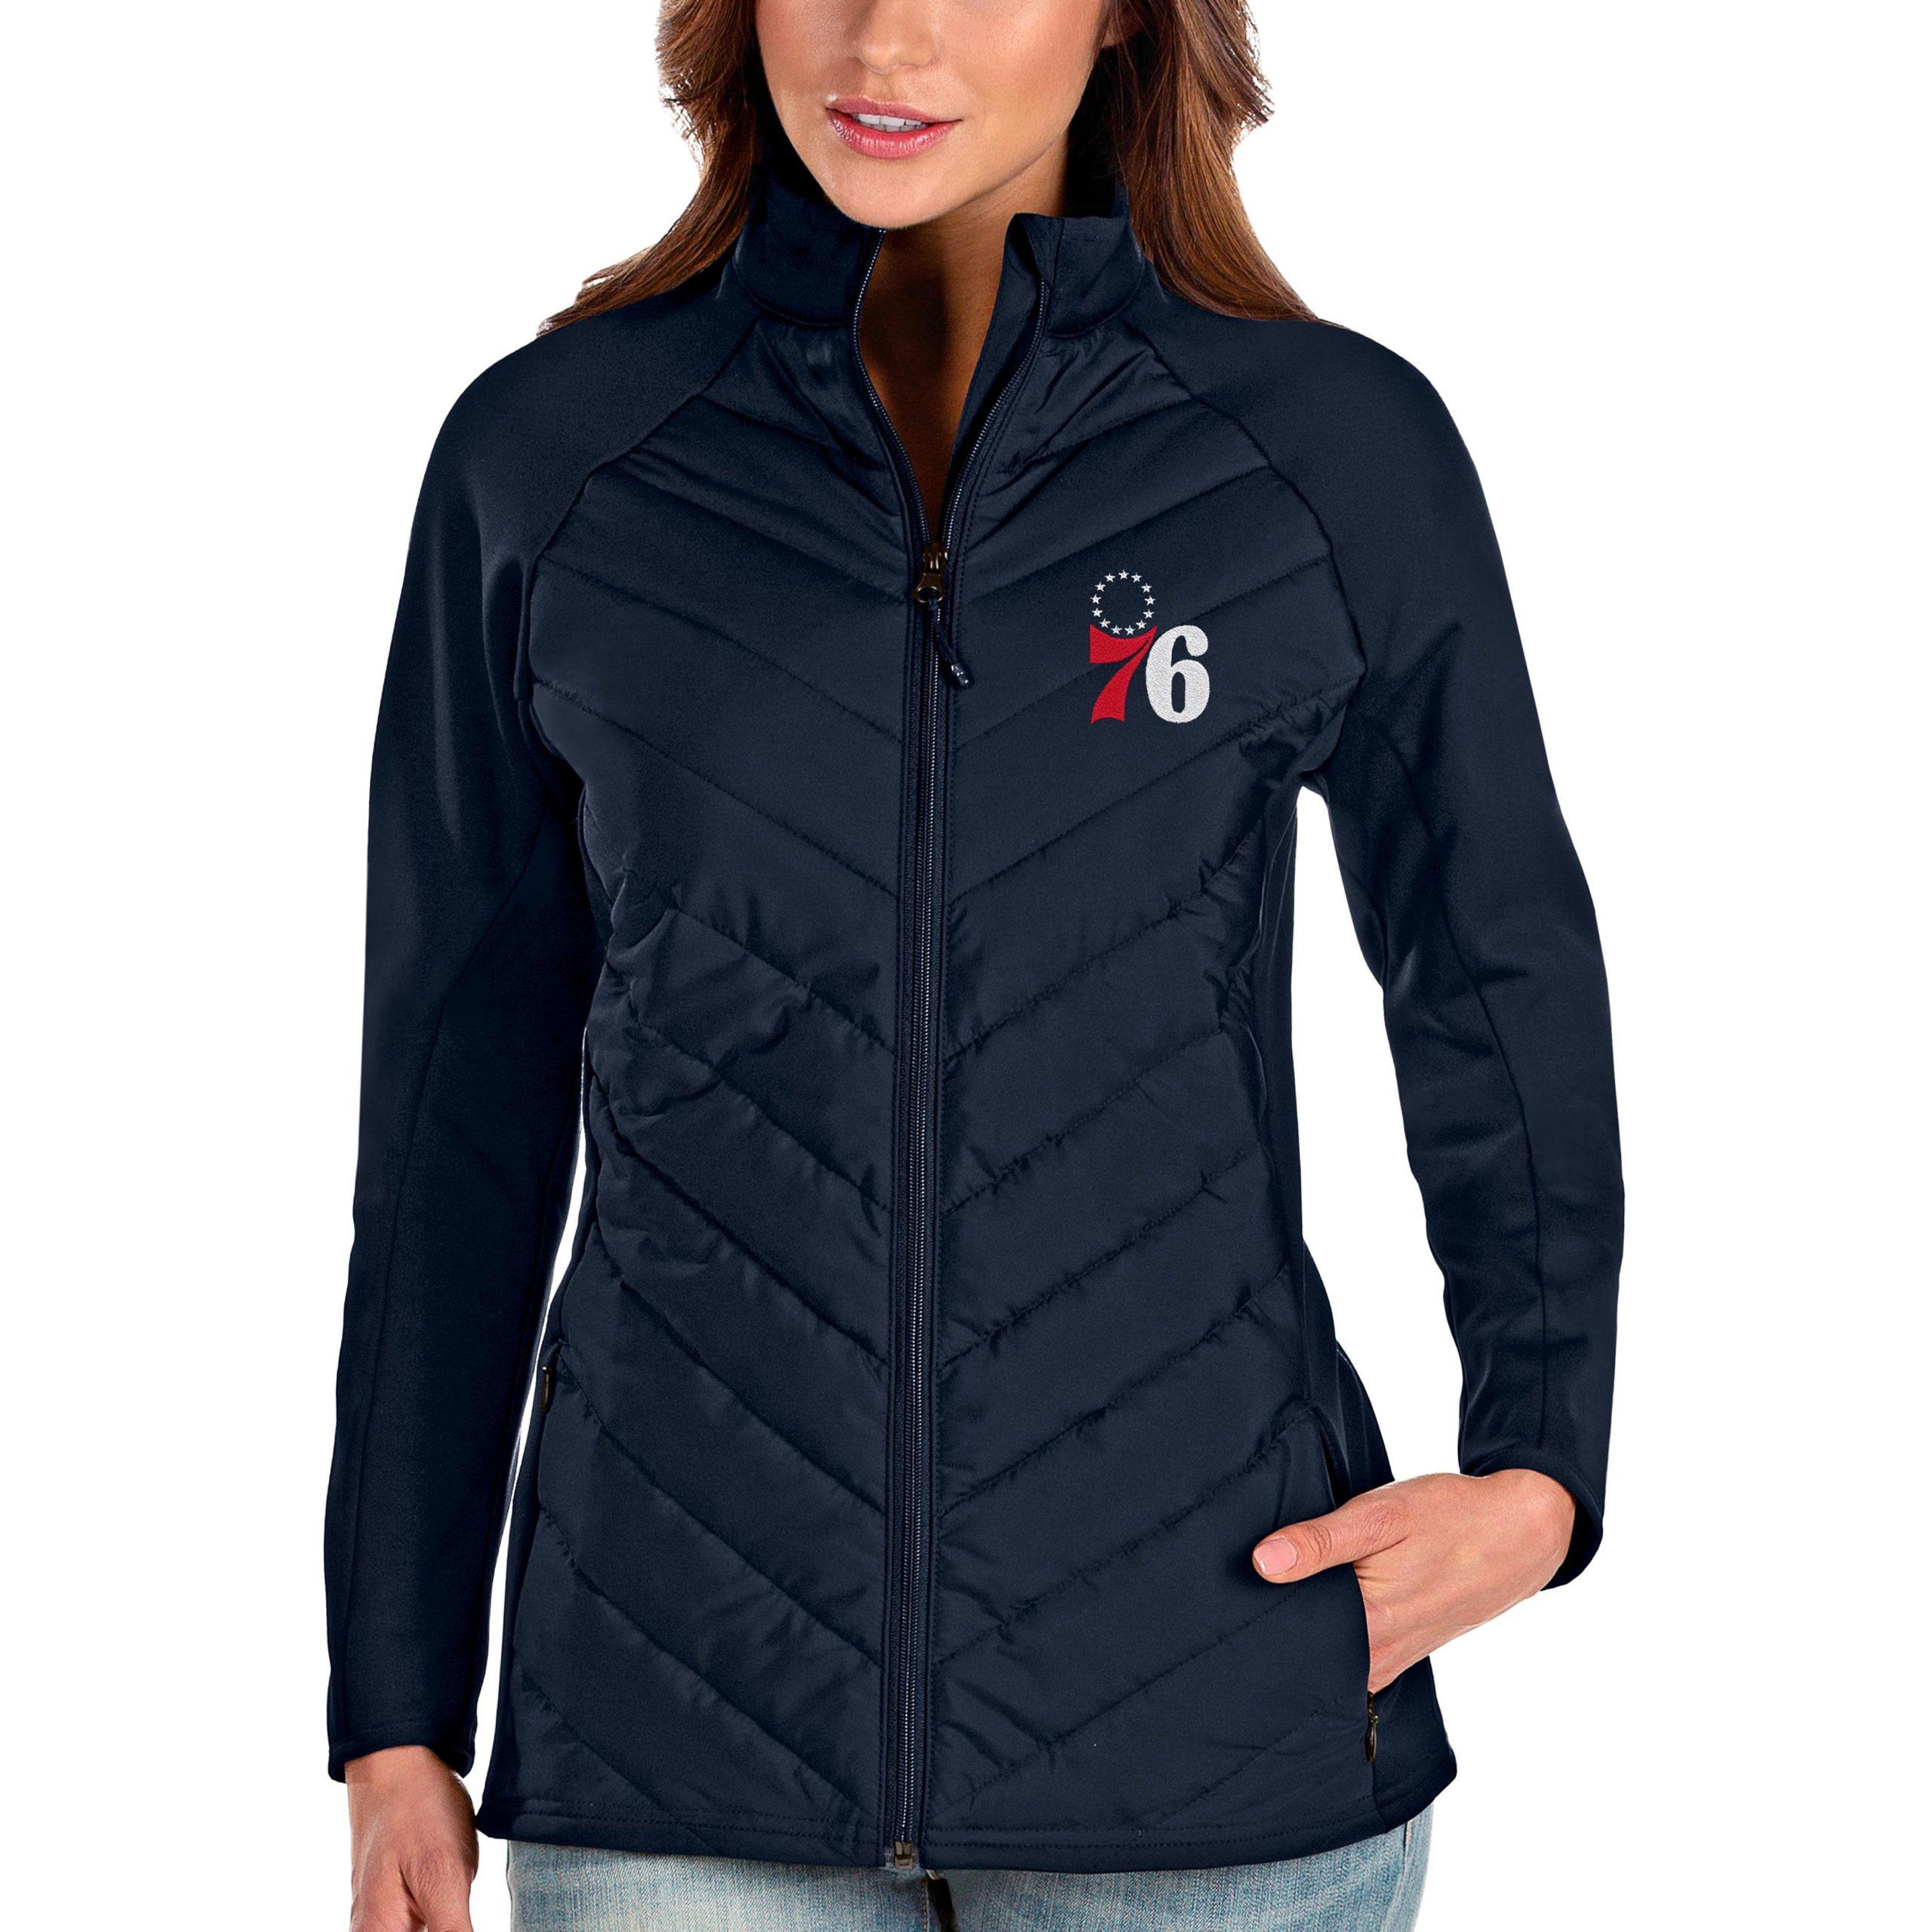 Philadelphia 76ers Antigua Women's Altitude Full-Zip Jacket - Navy